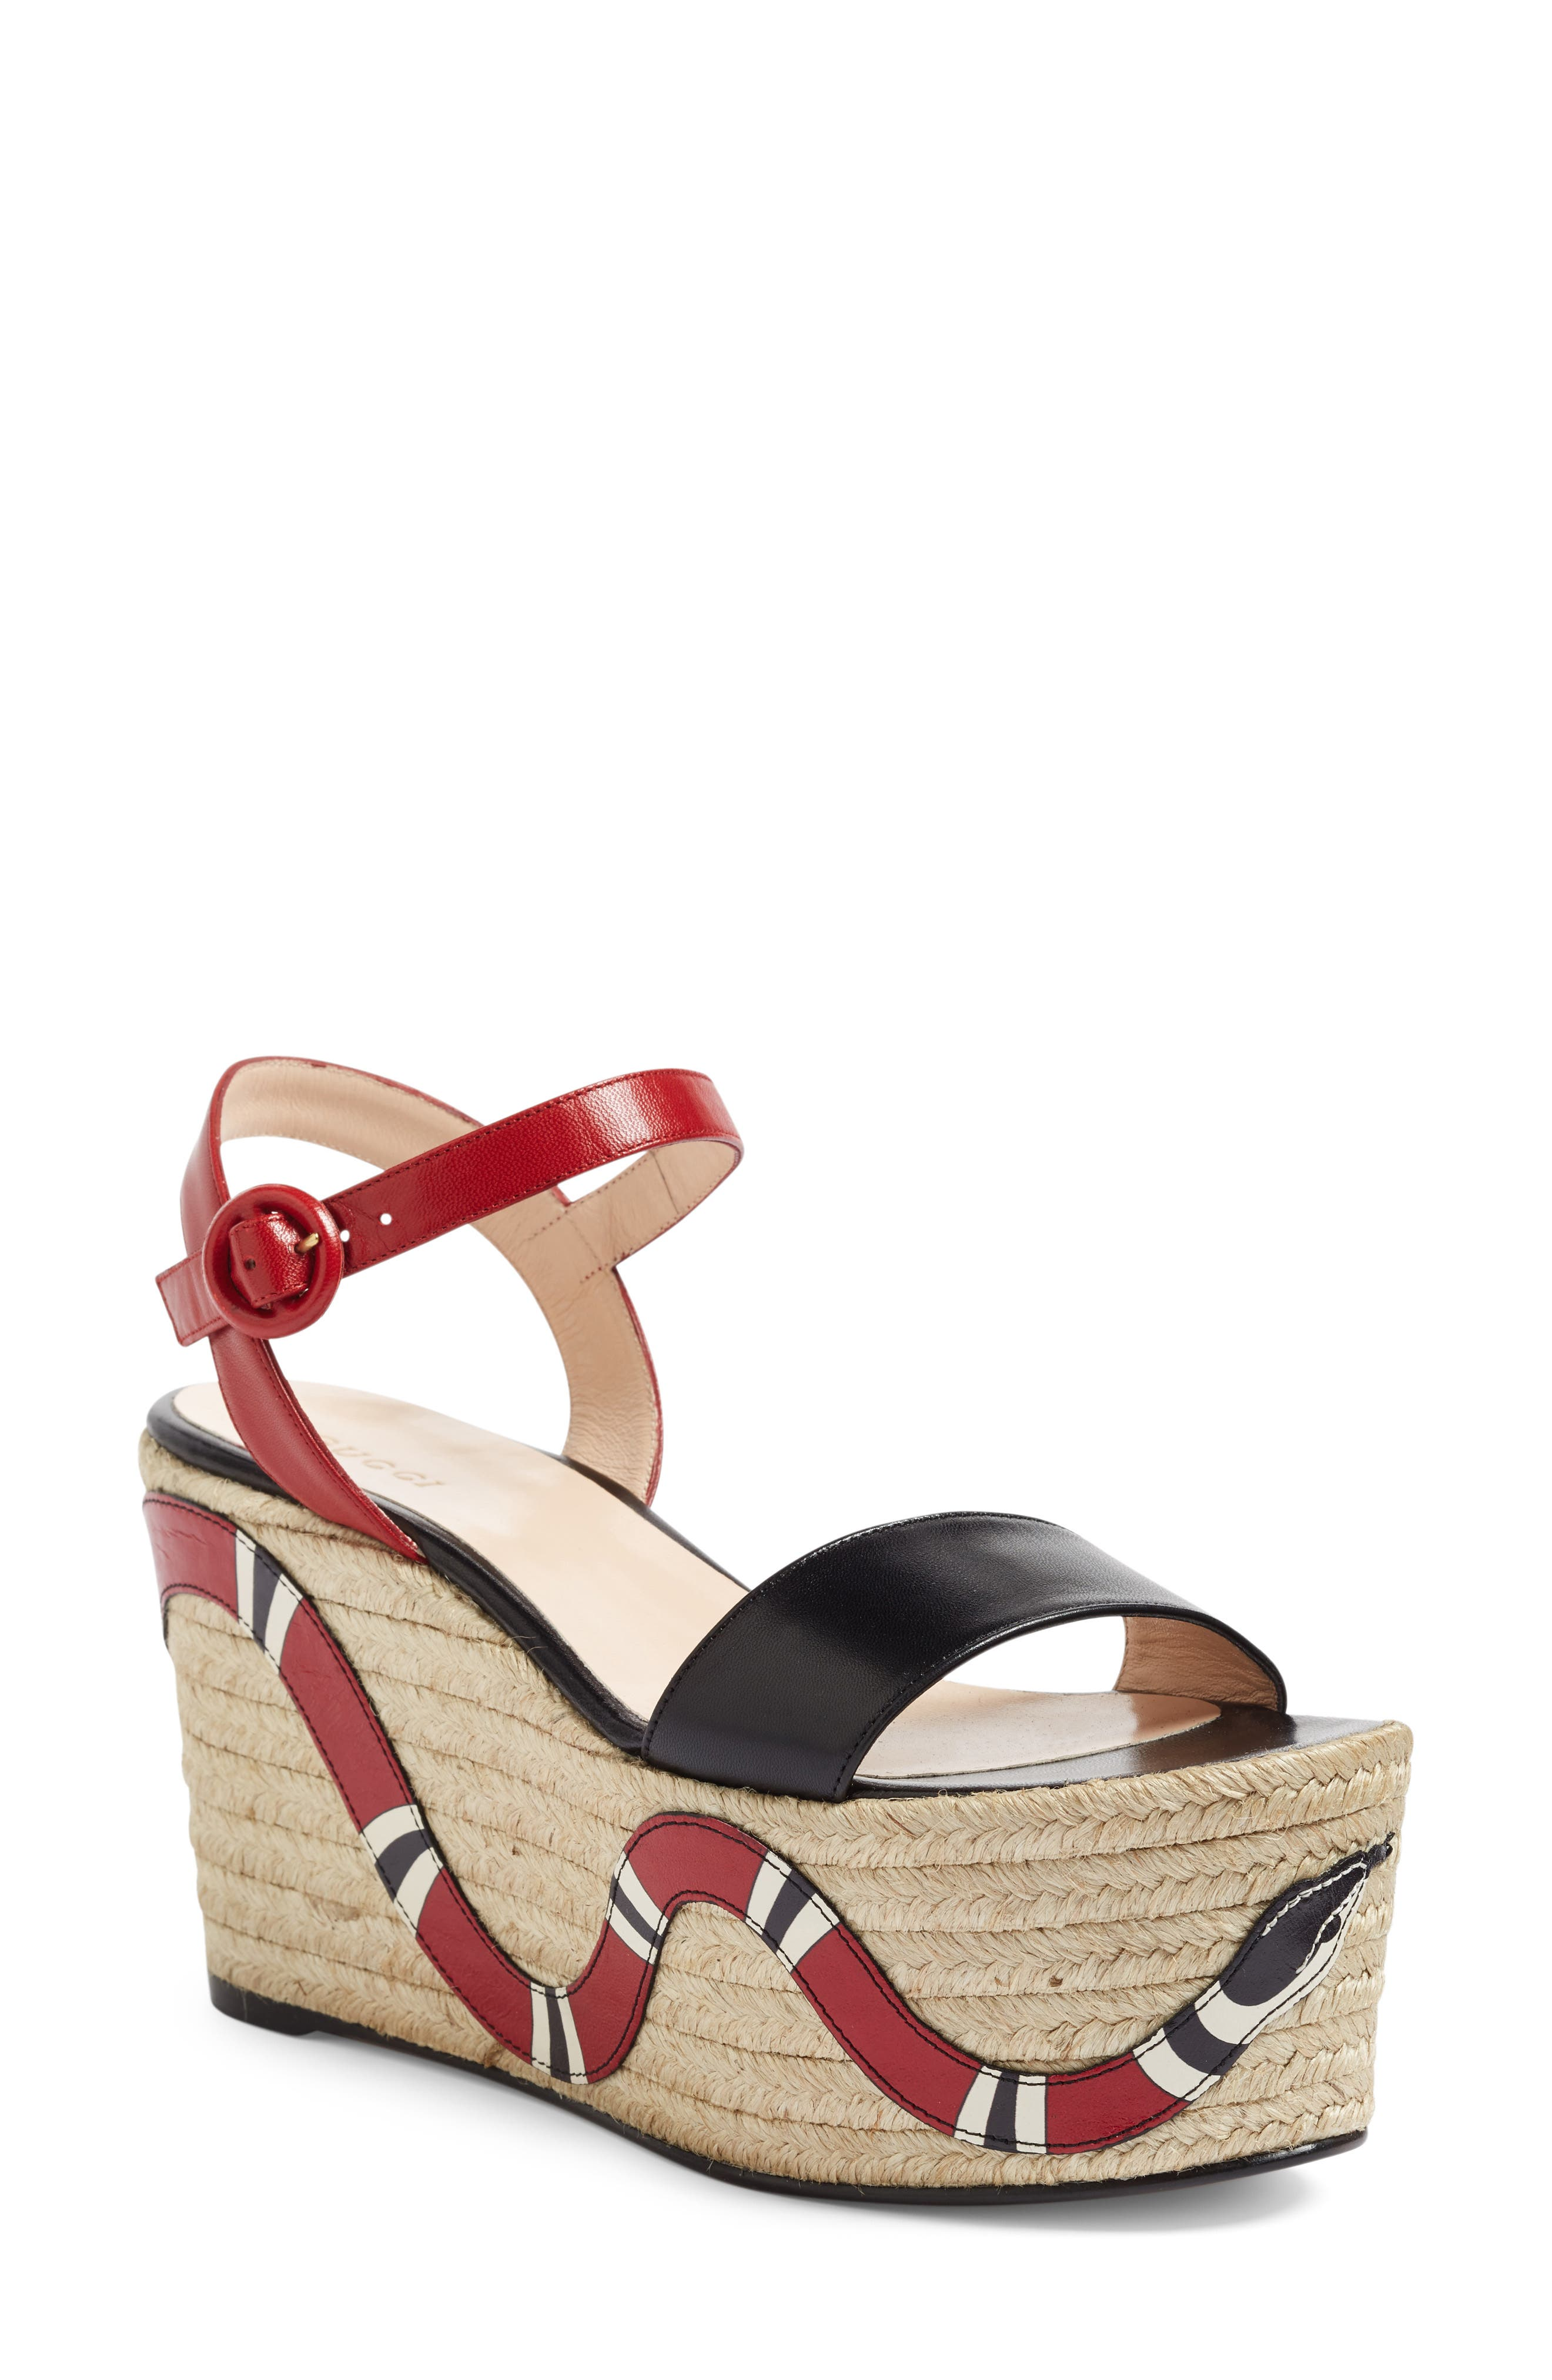 Gucci Barbette Espadrille Wedge Sandal (Women)